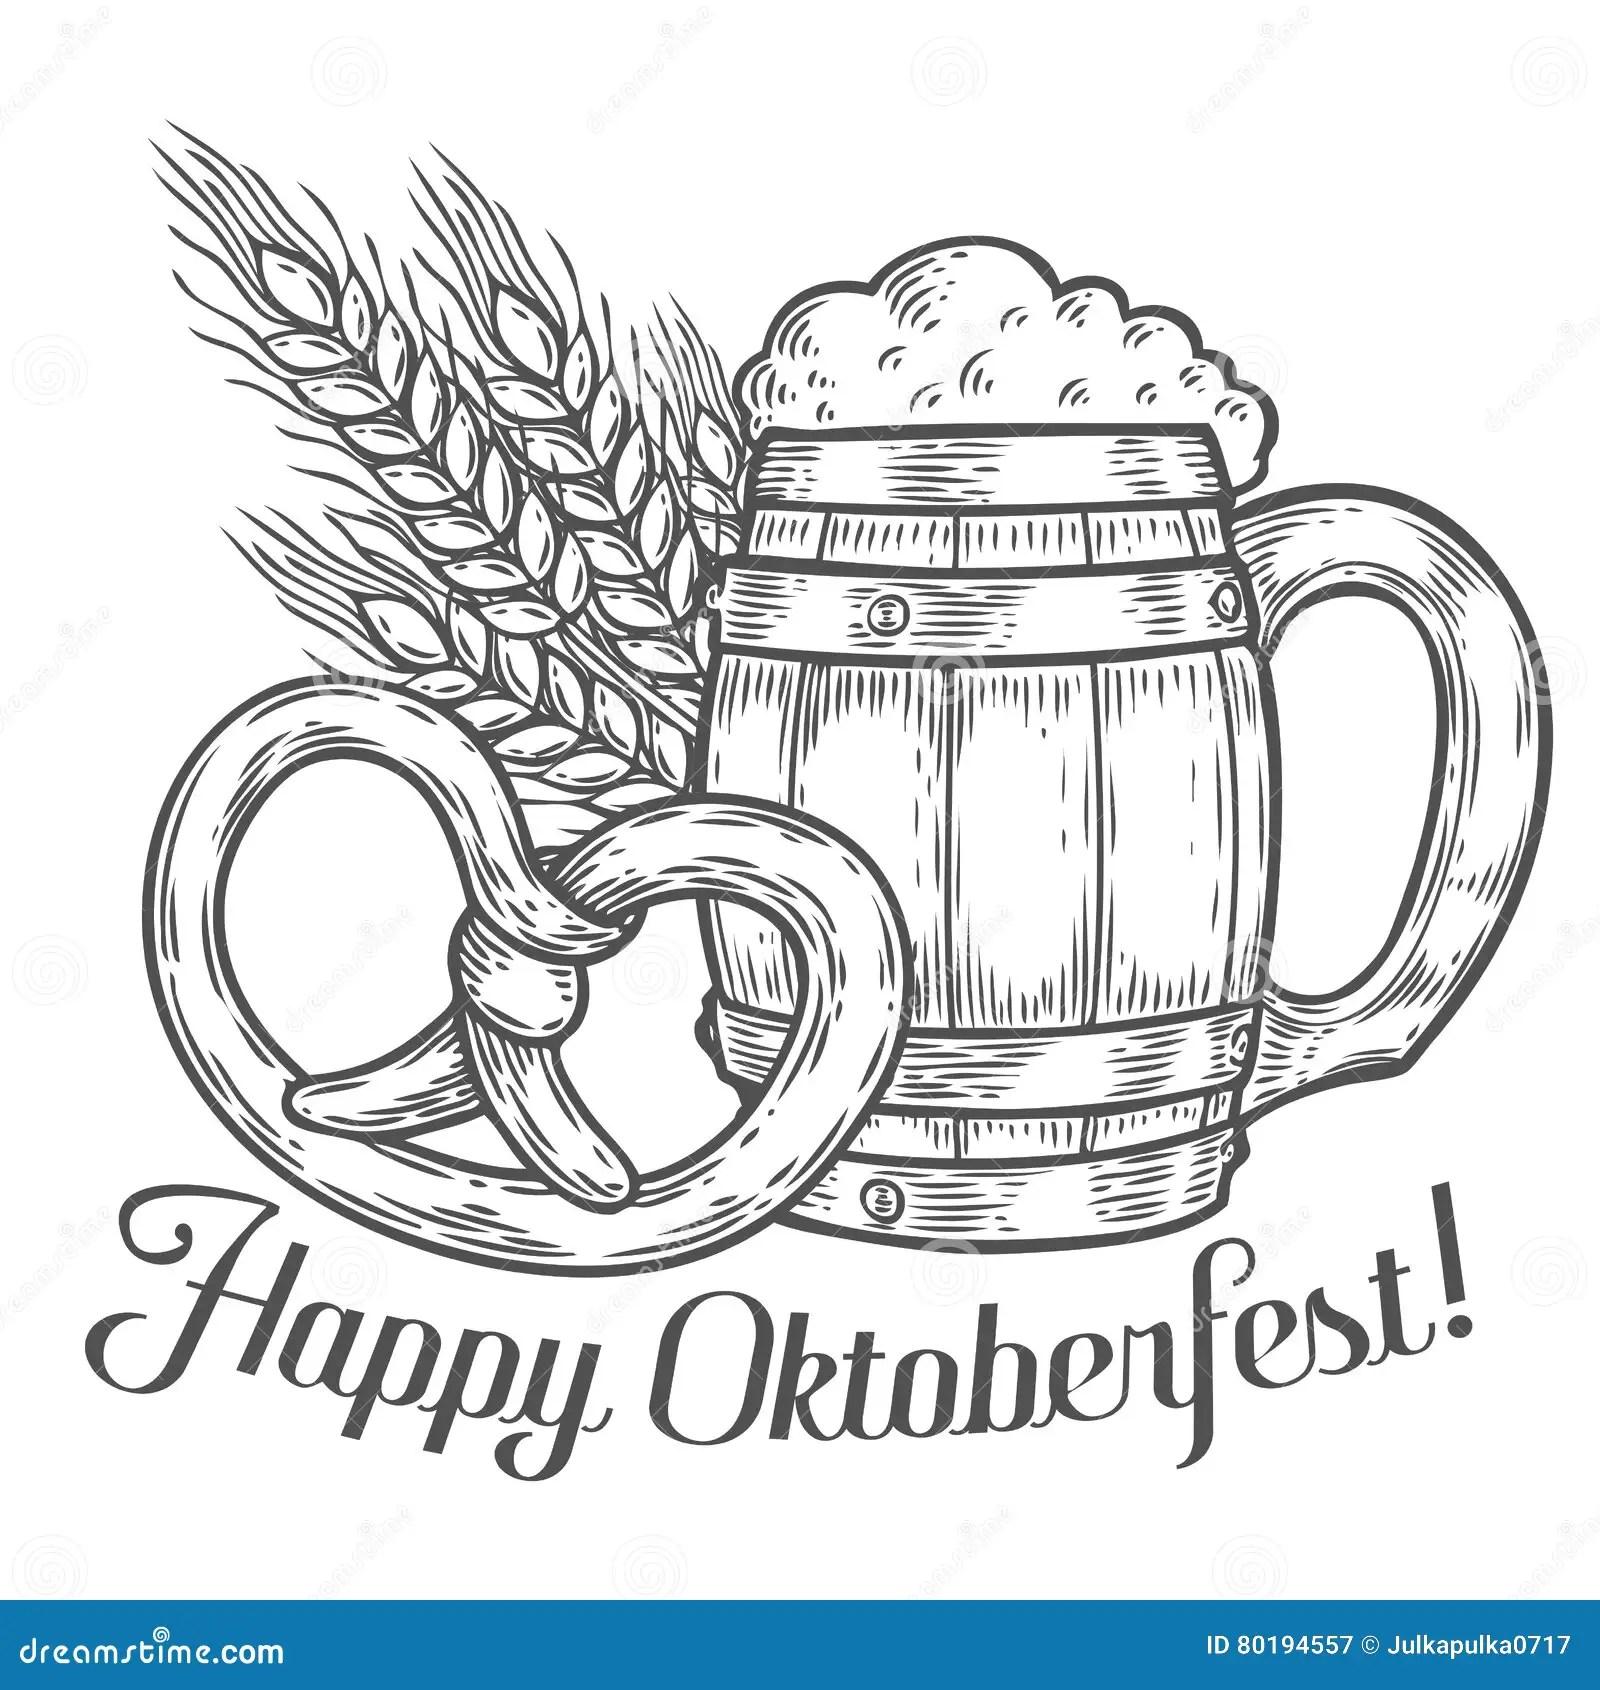 Wooden Craft Beer Mug Pretzel Wheat Happy Oktoberfest